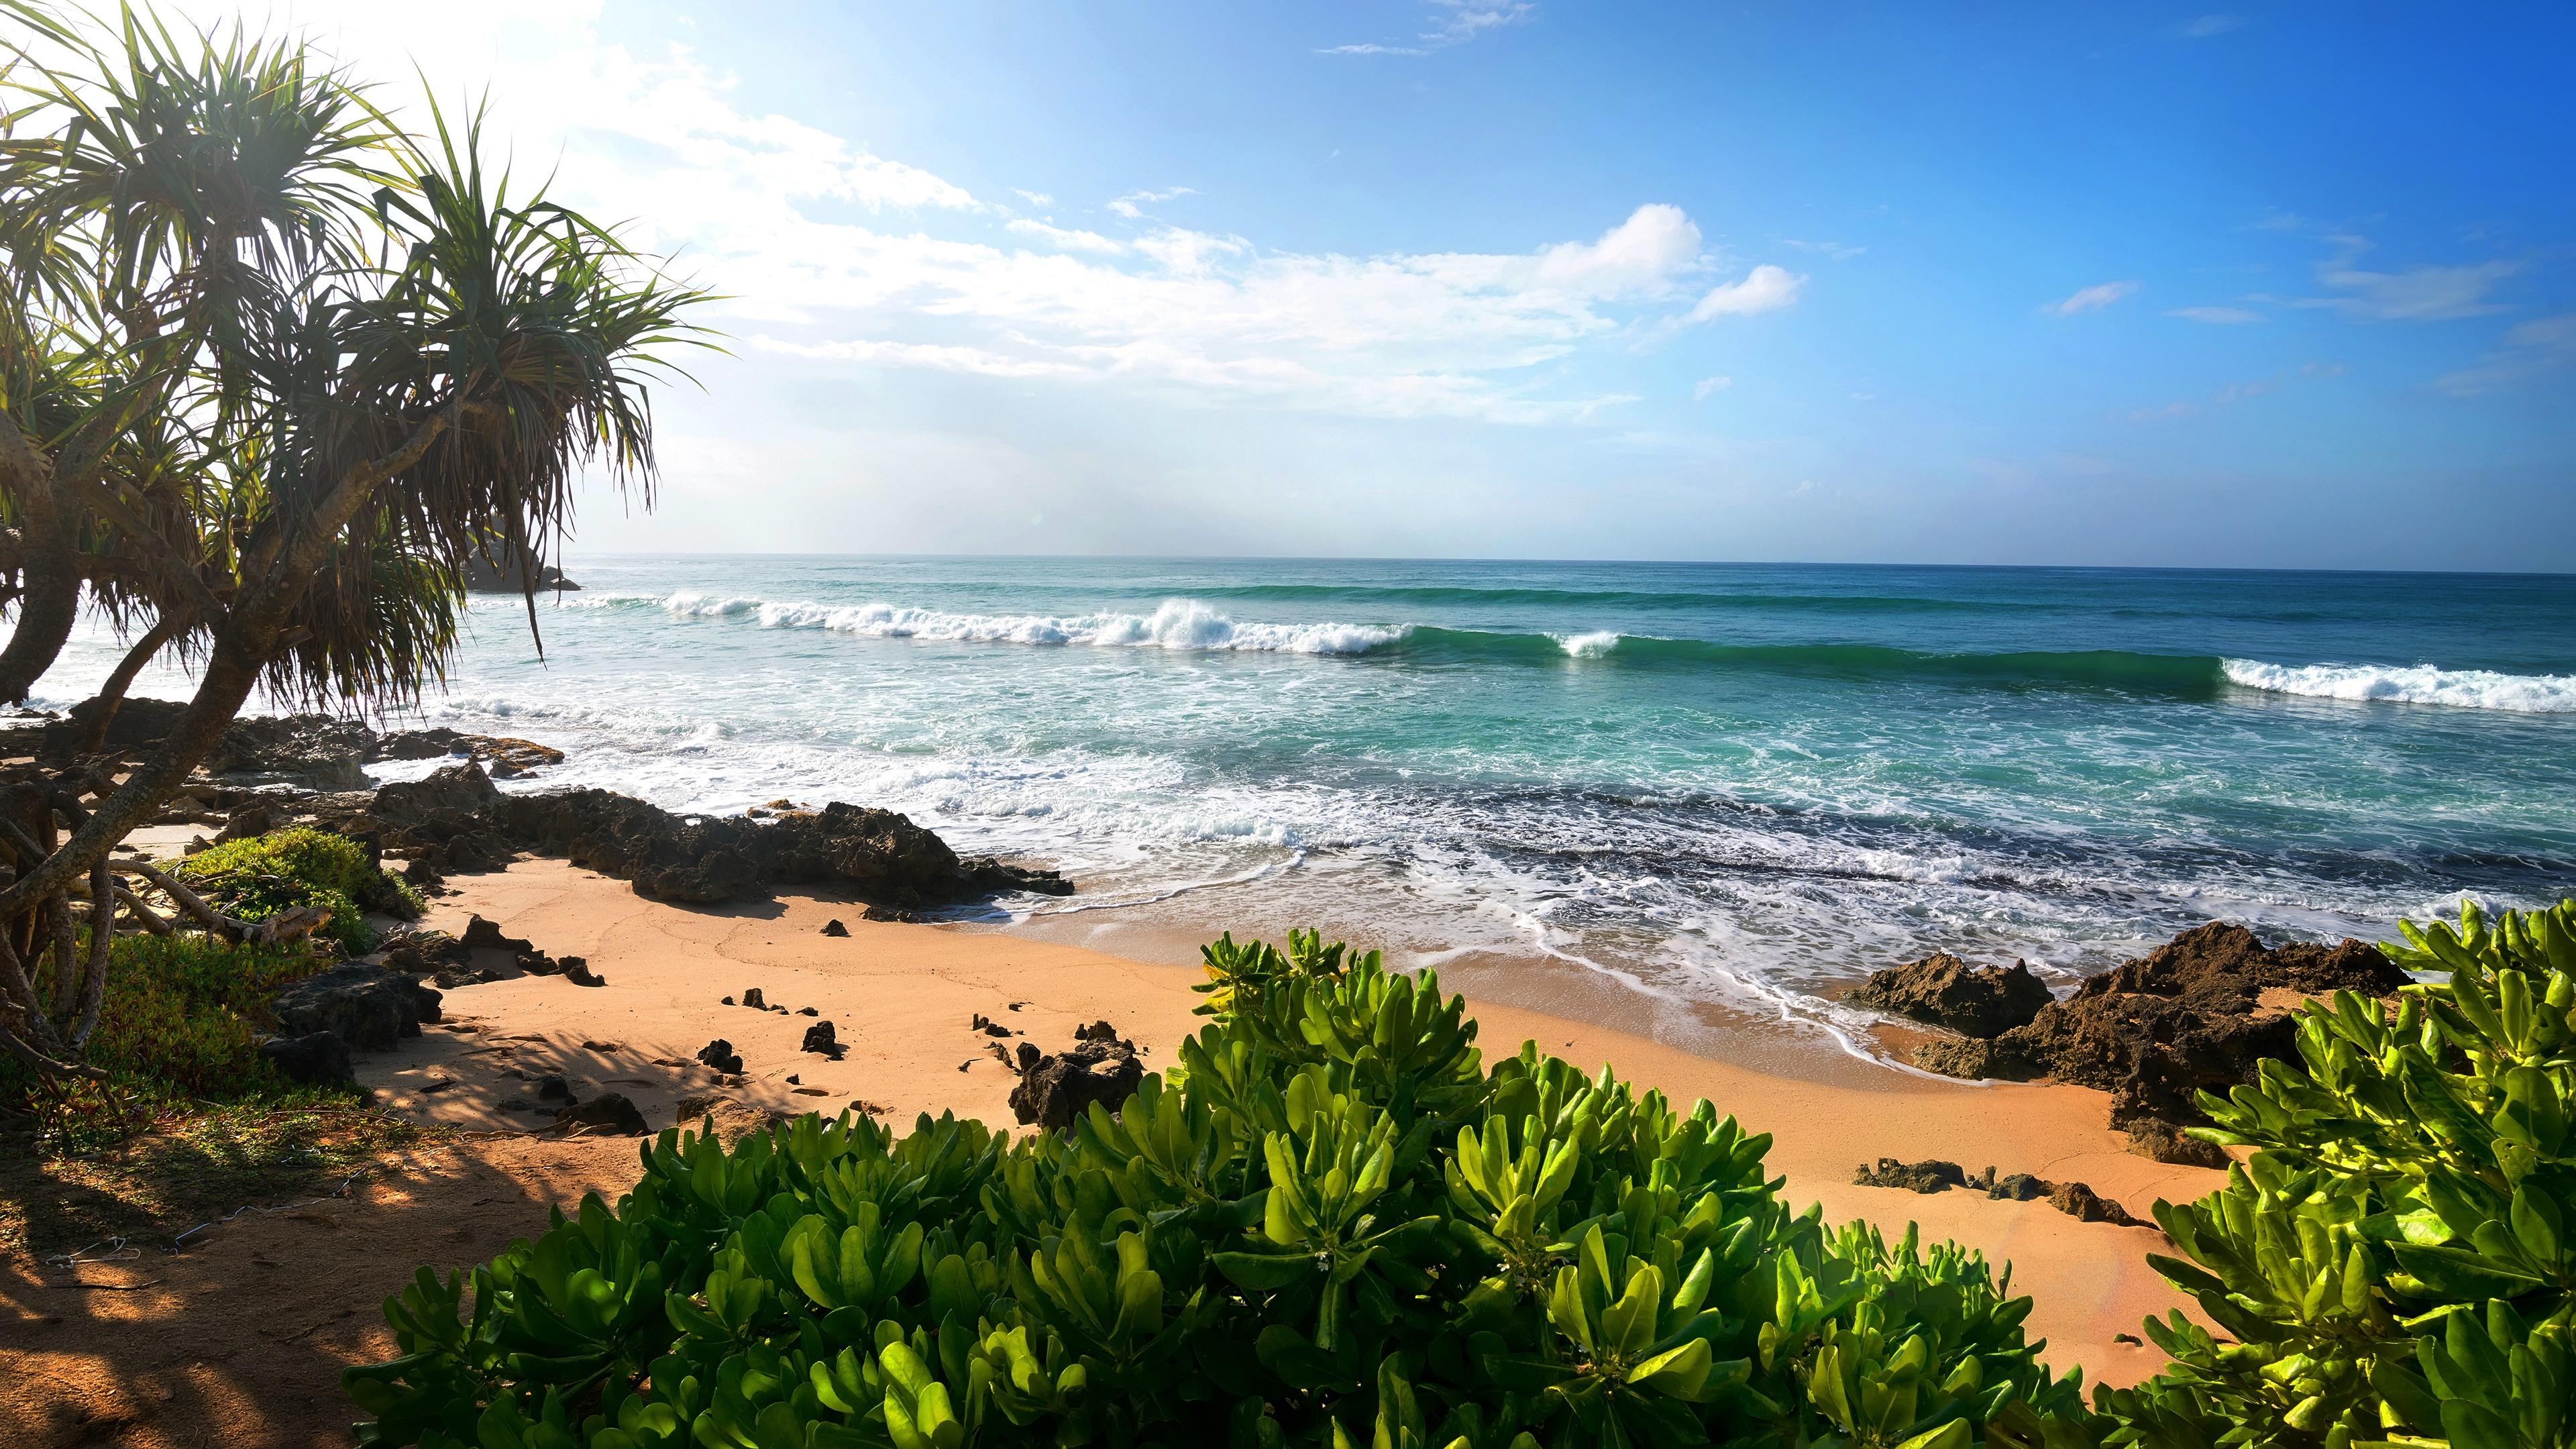 Tropical Summer Beach 4K UltraHD Wallpaper - backiee